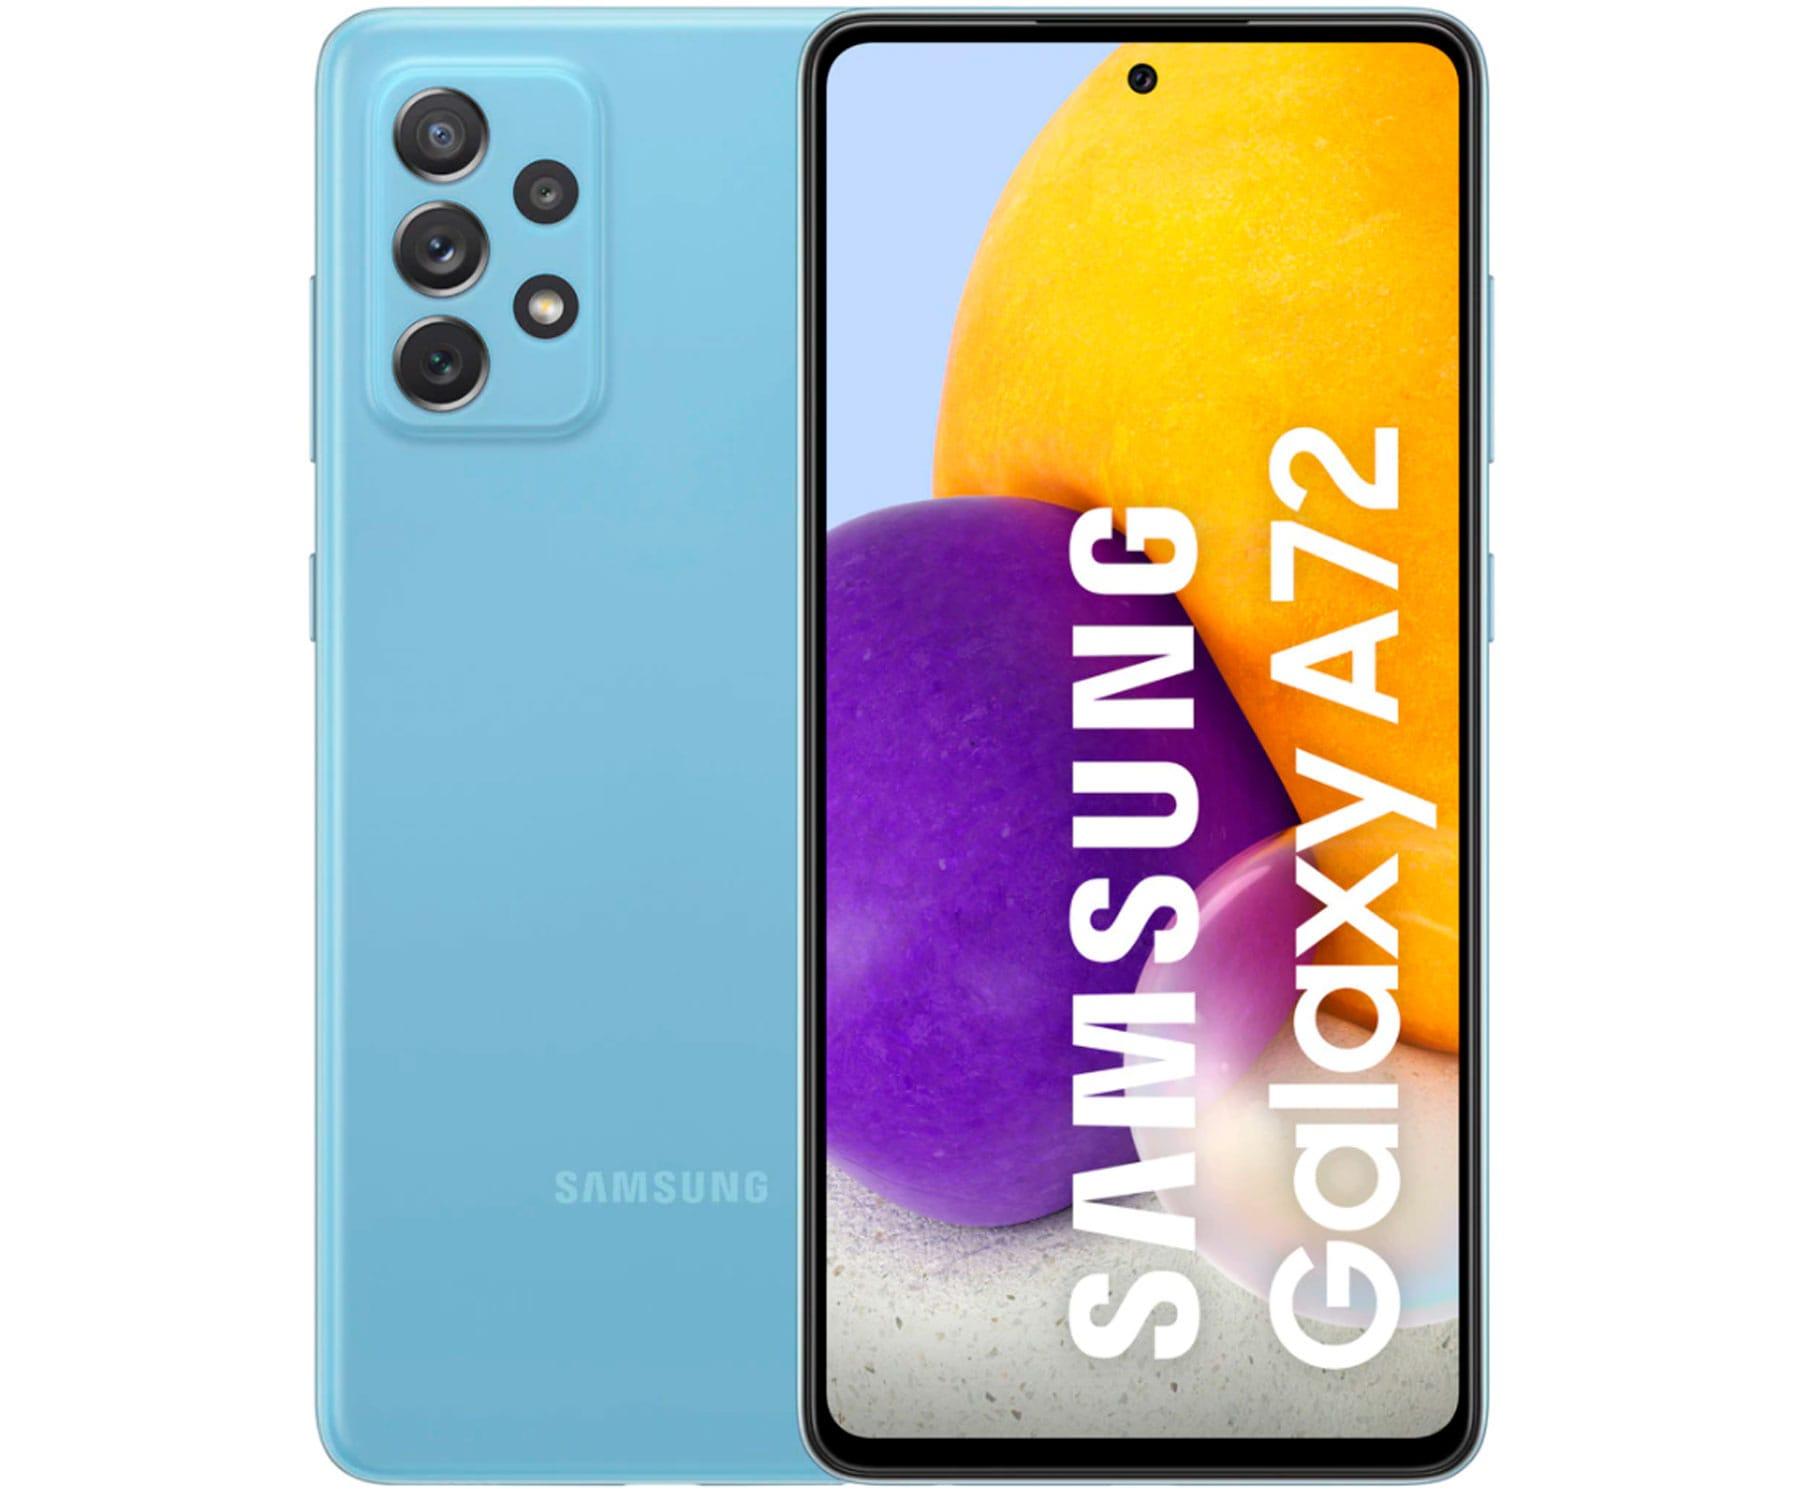 SAMSUNG GALAXY A72 AZUL MÓVIL 4G DUAL SIM 6.7'' FHD+ OCTACORE 256GB 8GB RAM QUADCAM 64MP SELFIES 32MP